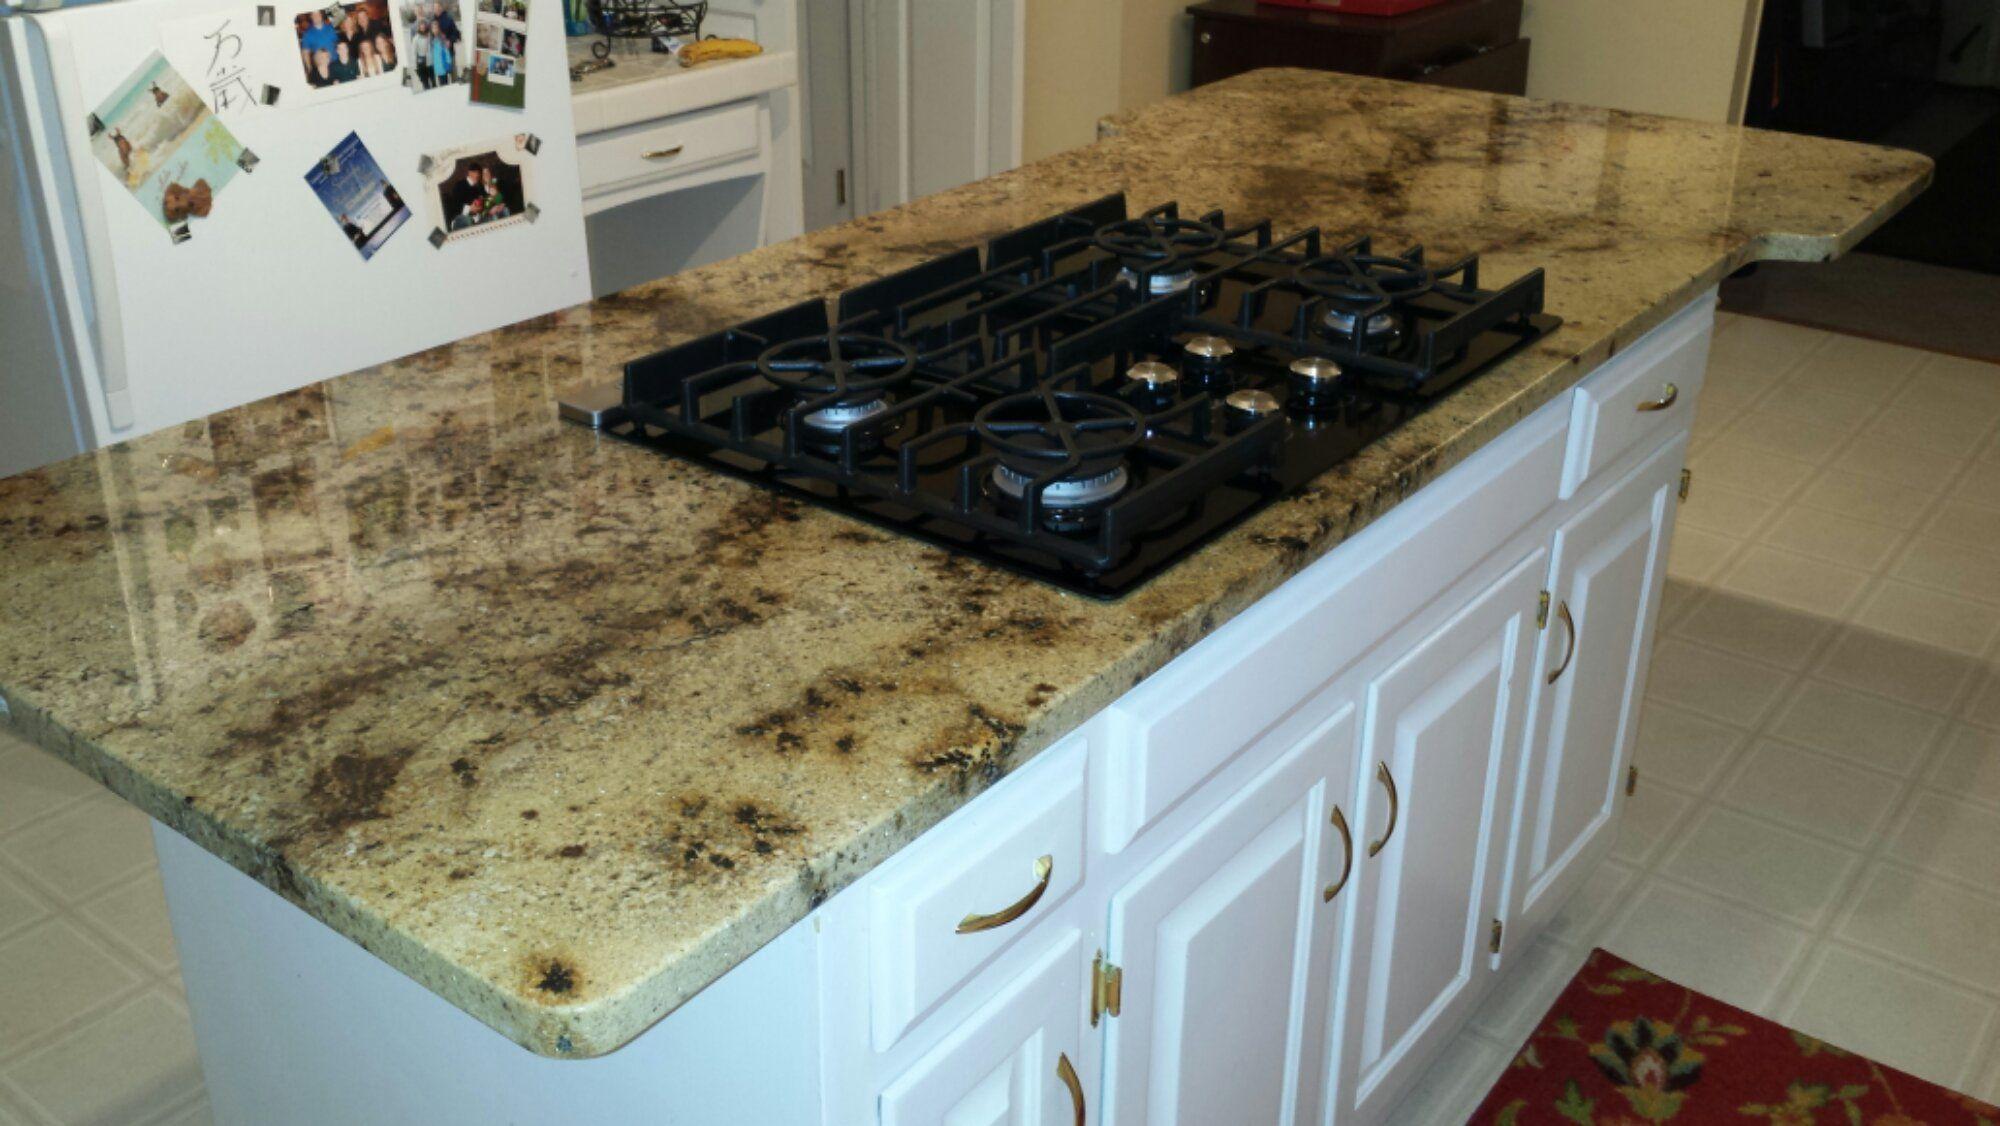 New Kitchen Island Granite Countertop With Cooktop Kitchen Island Countertop Kitchen Cooktop Granite Kitchen Island